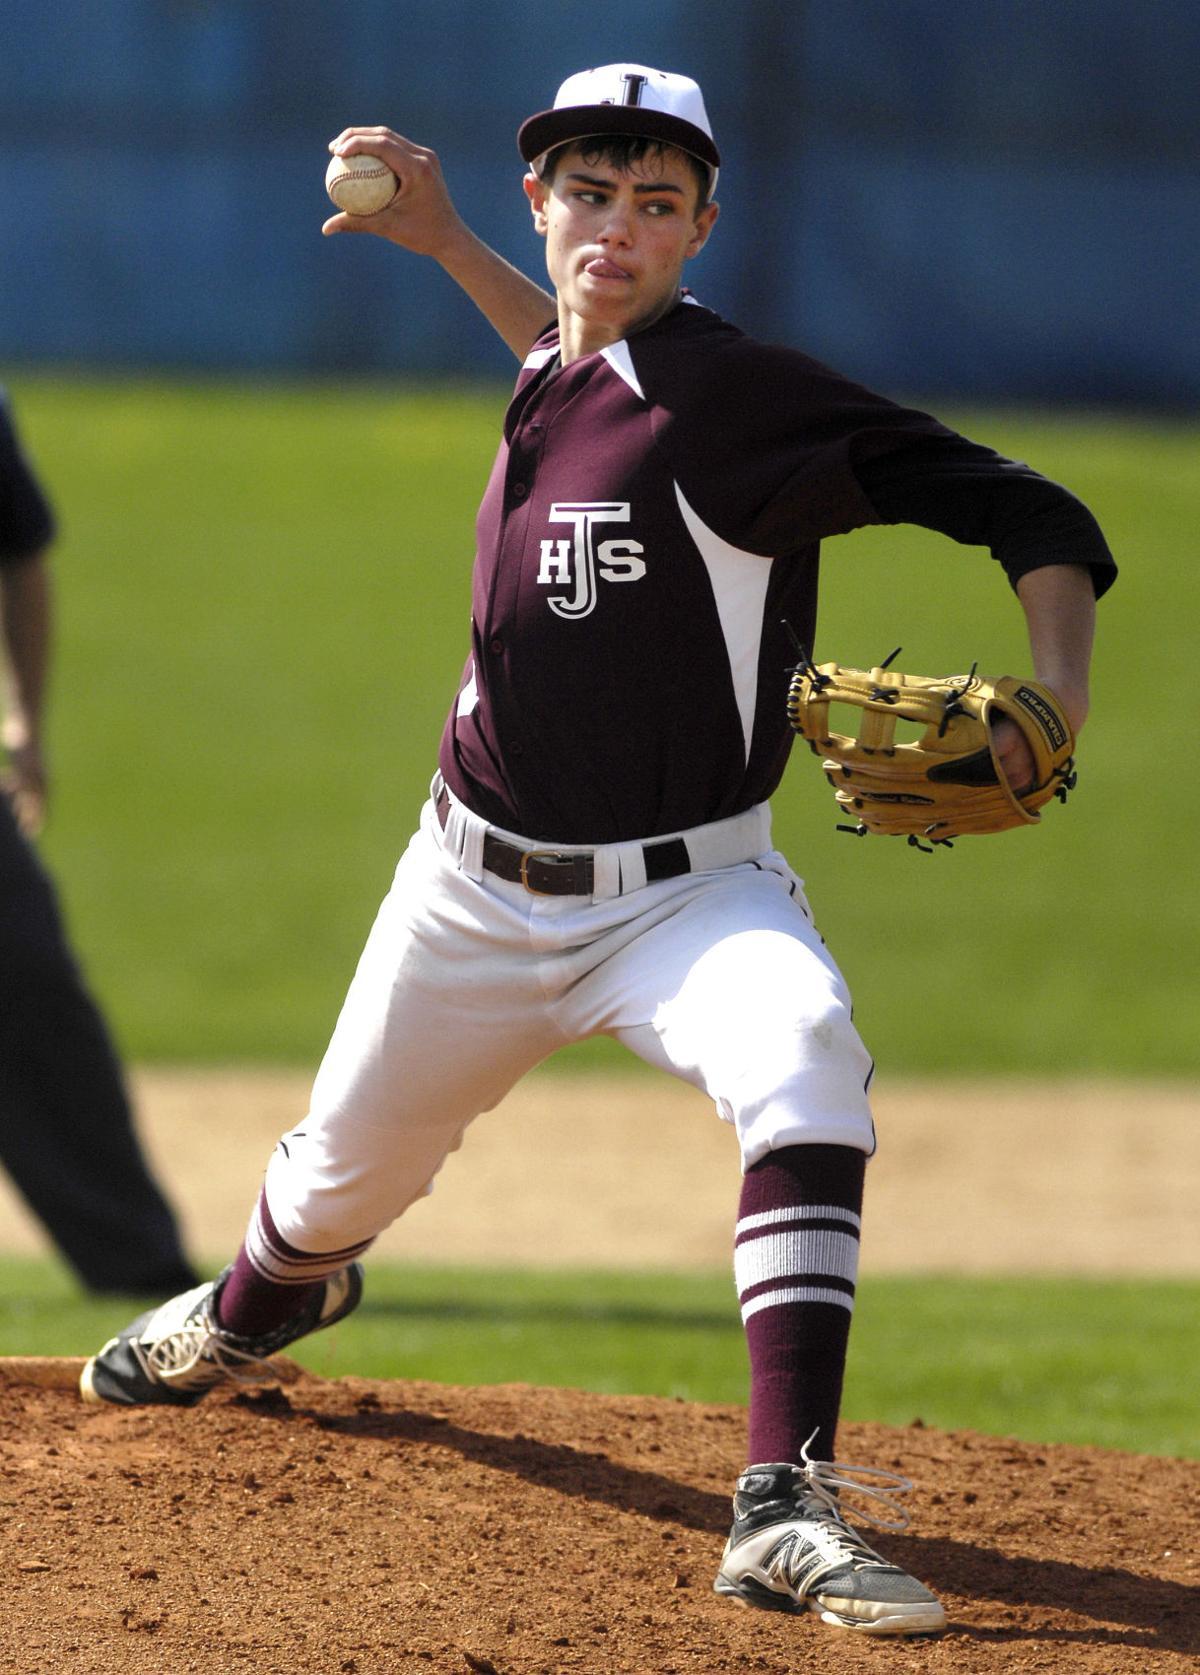 Jimtown's Nick Floyd flings the baseball with purpose